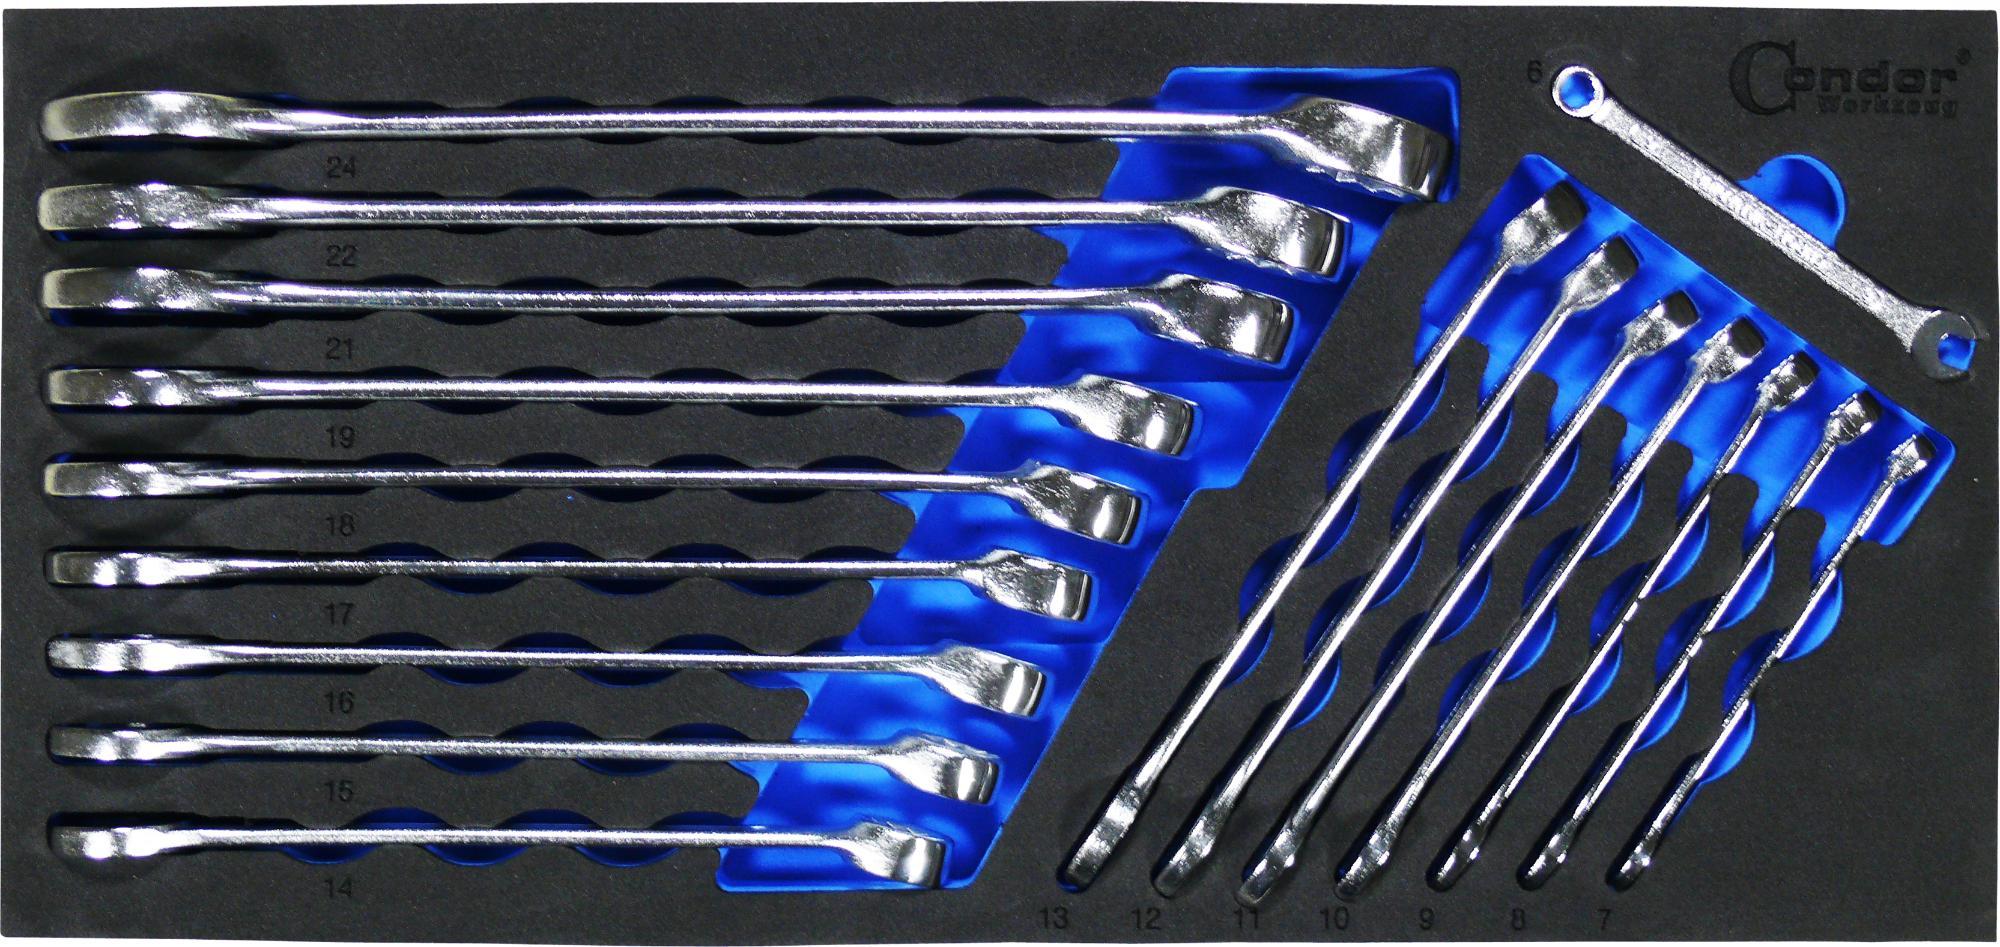 Foam vložka Kľúč očko-vidlica Nr. 35/17T, 17-dielna., 6-24 mm